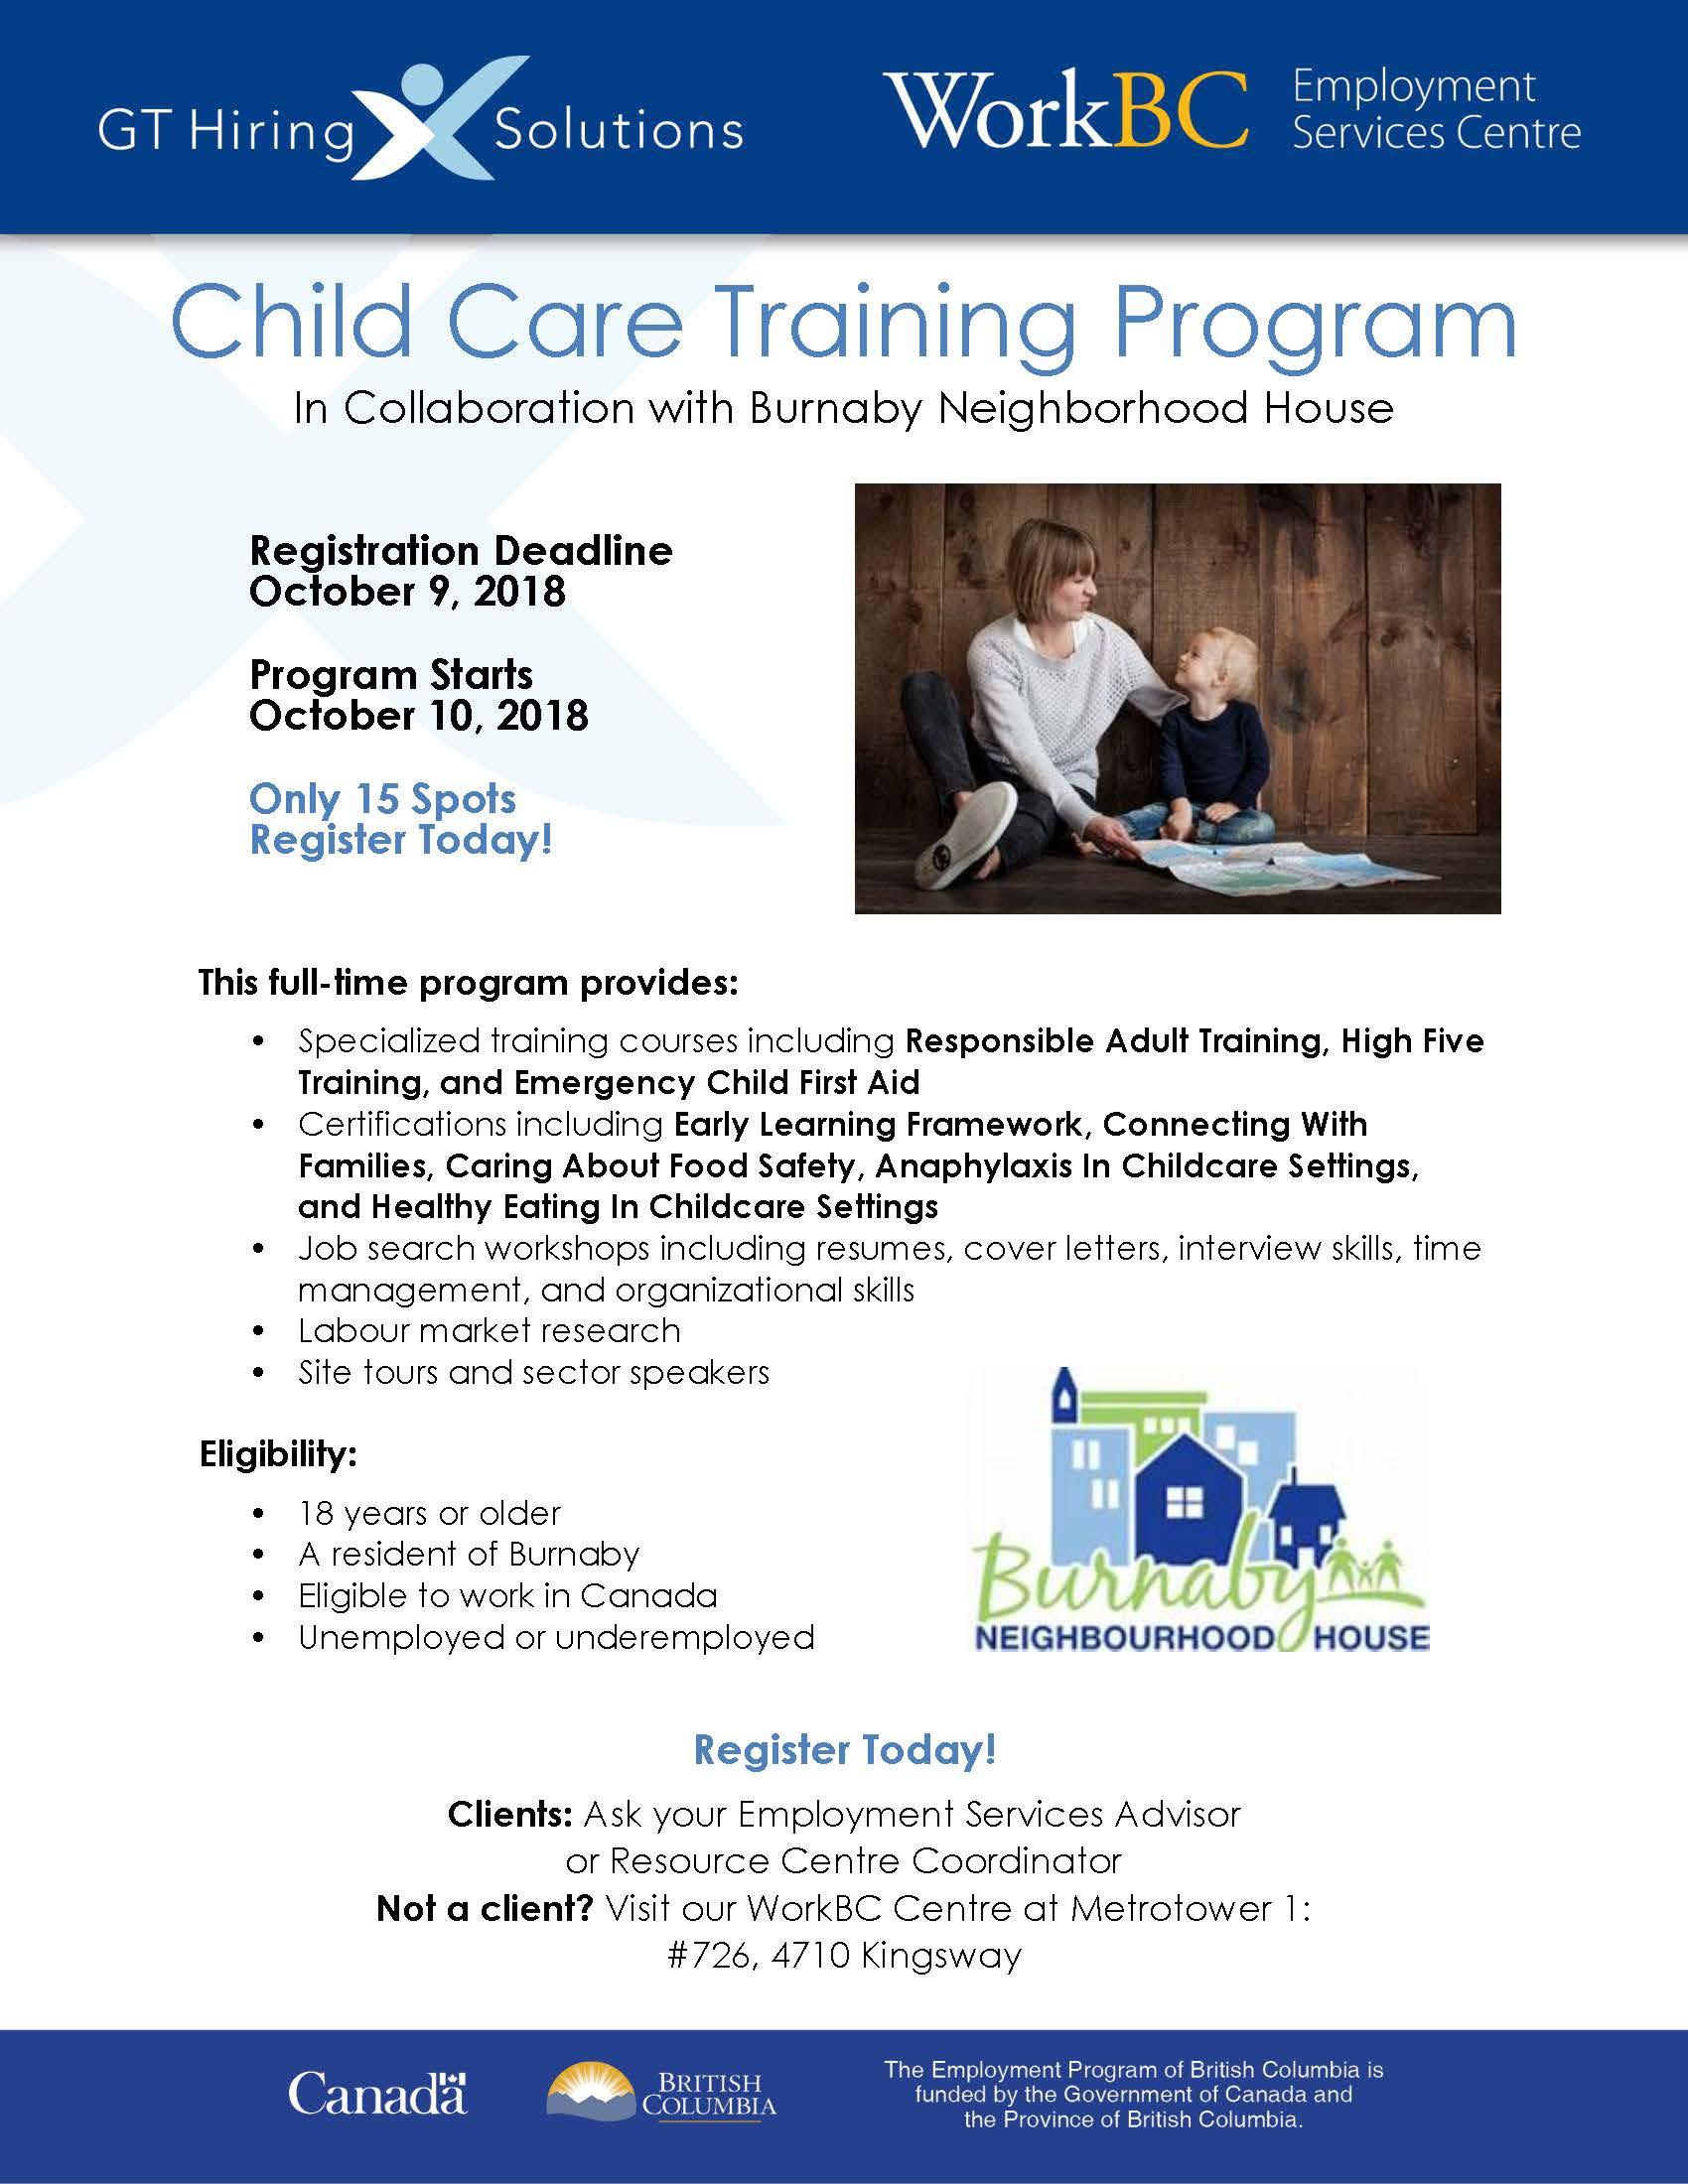 Burnaby Neighbourhood House Child Care Training Program